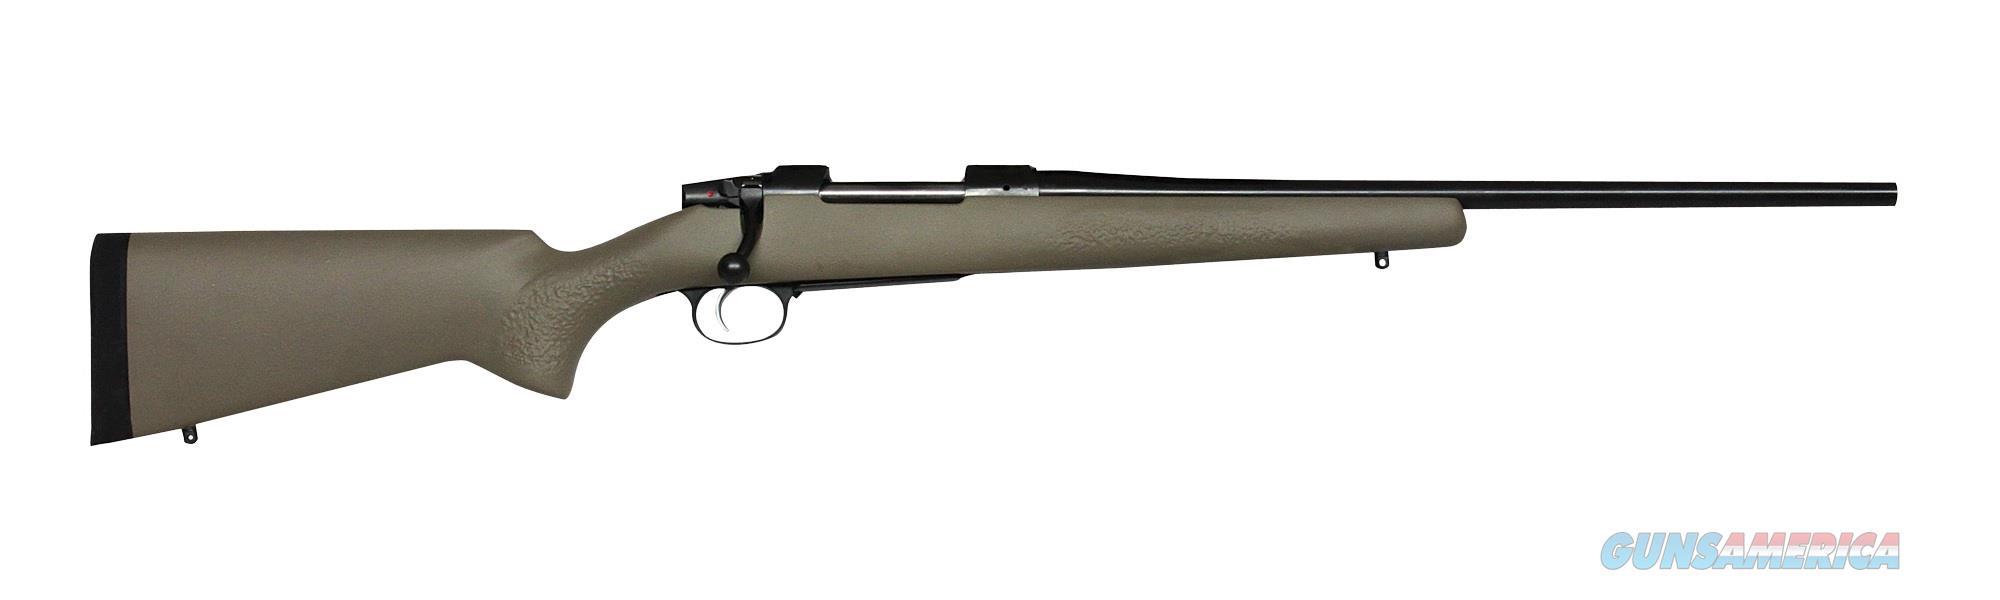 "CZ-USA CZ 557 Sporter Manners .30-06 Spg 20.5"" 5Rds 04820   Guns > Rifles > CZ Rifles"